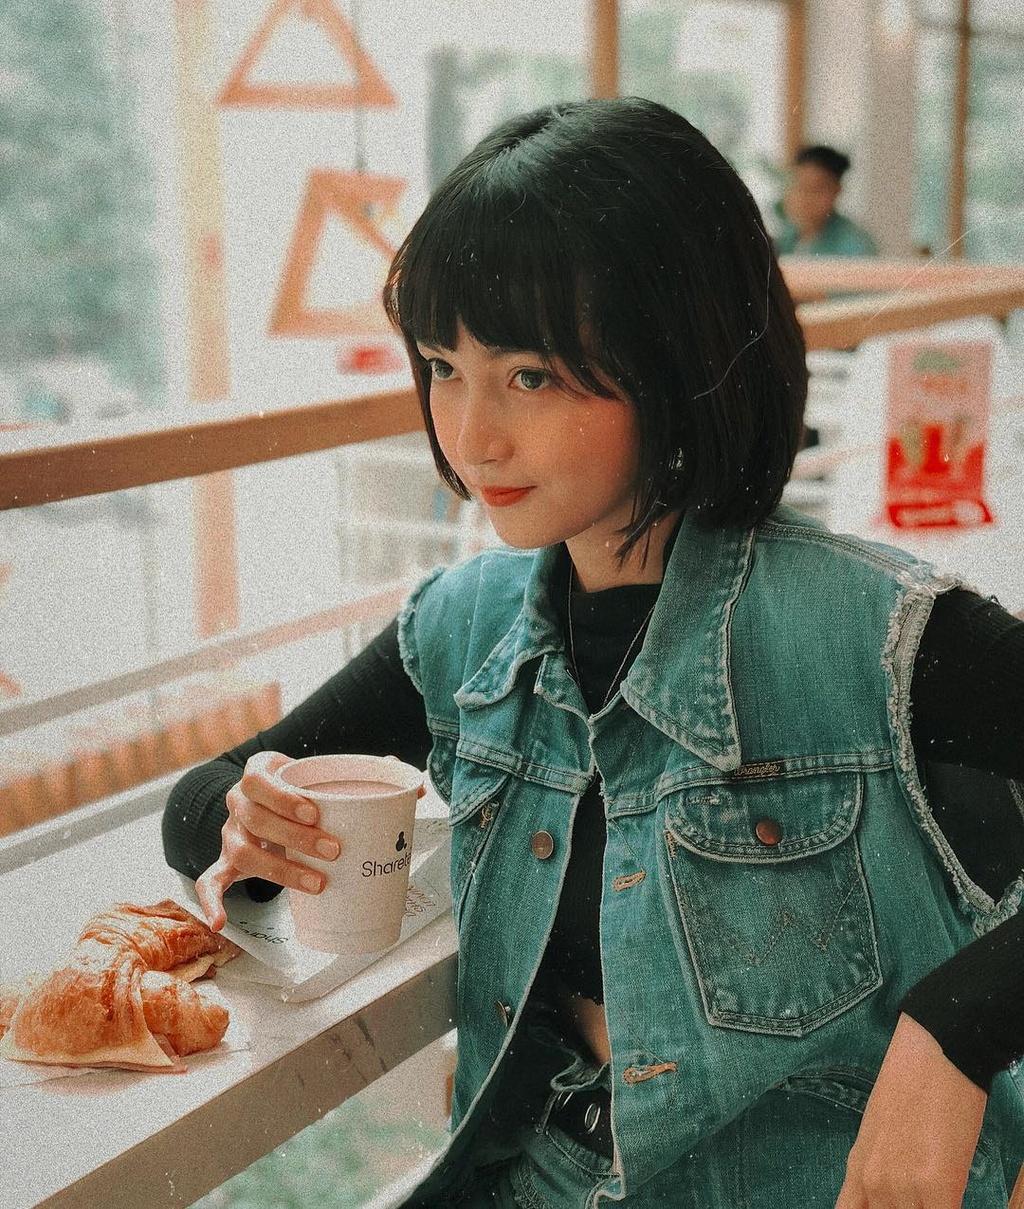 Hot girl tuoi Hoi: Nguoi hanh phuc ben chong, ke theo nghiep dien xuat hinh anh 21